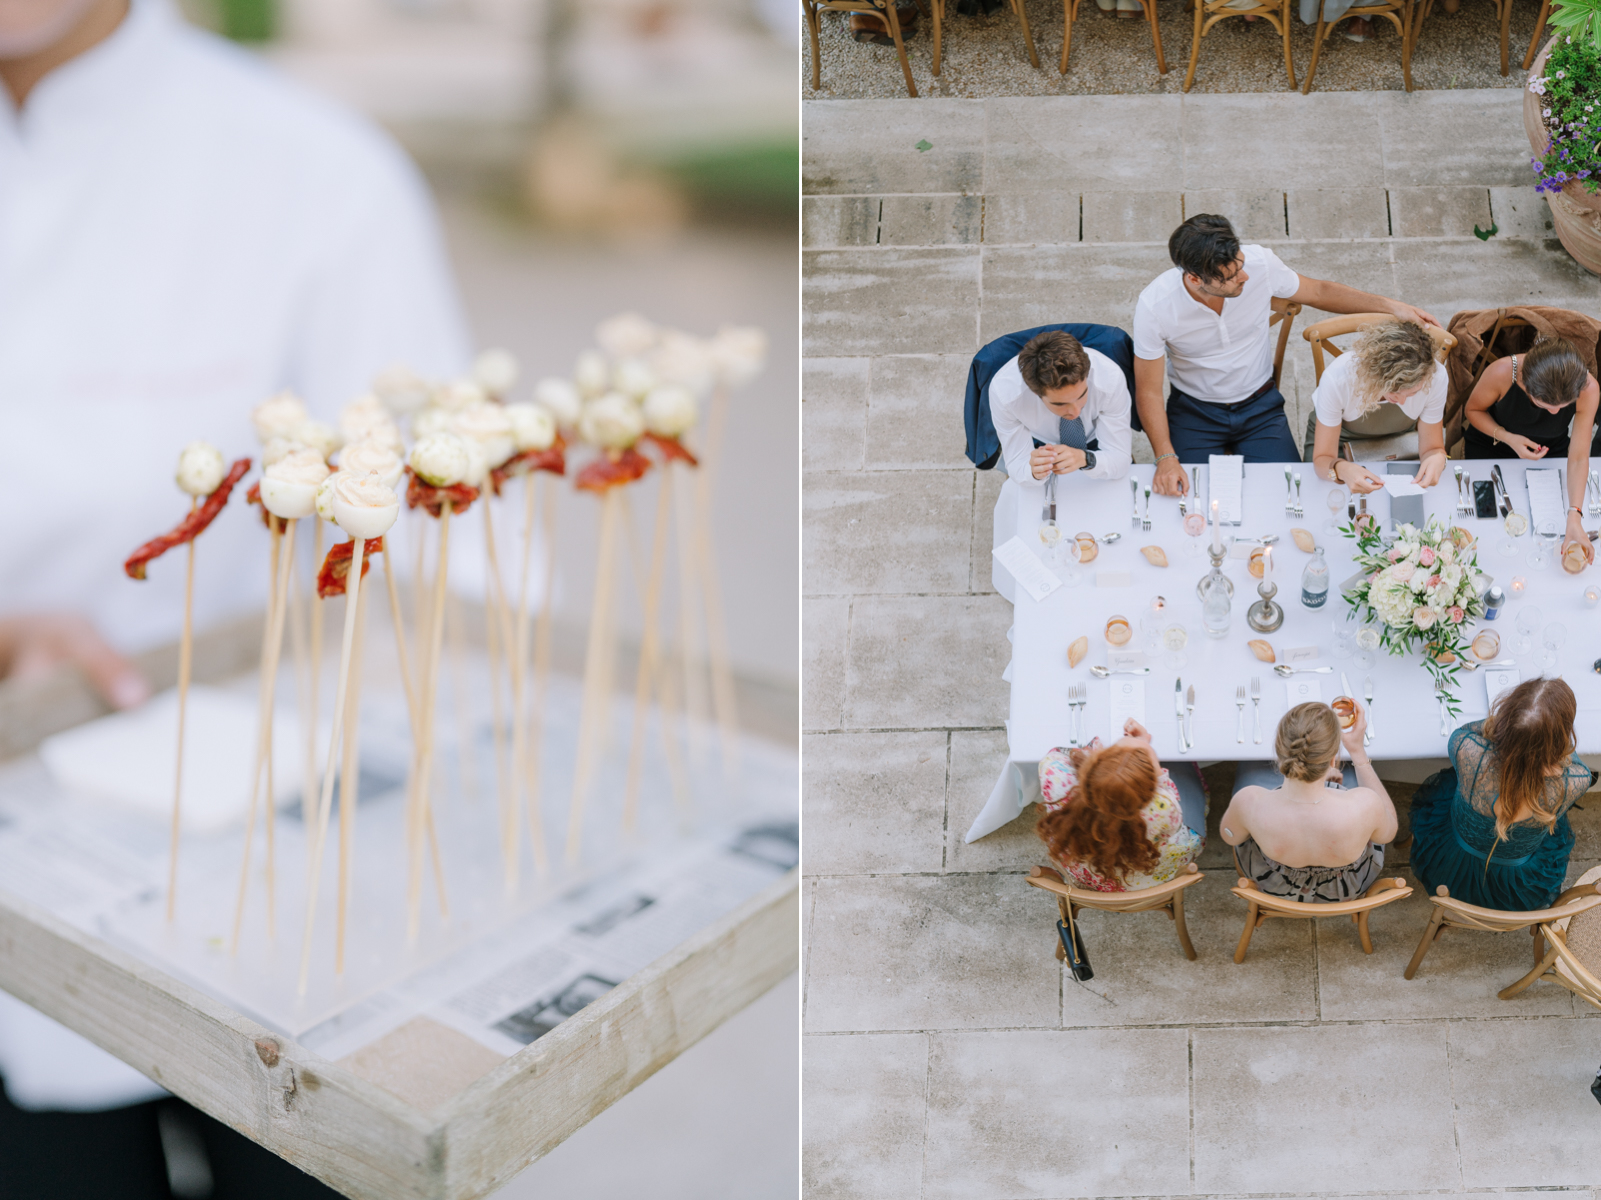 Boheme-Moon-Photography-Wedding-in-Provence-France_028.jpg